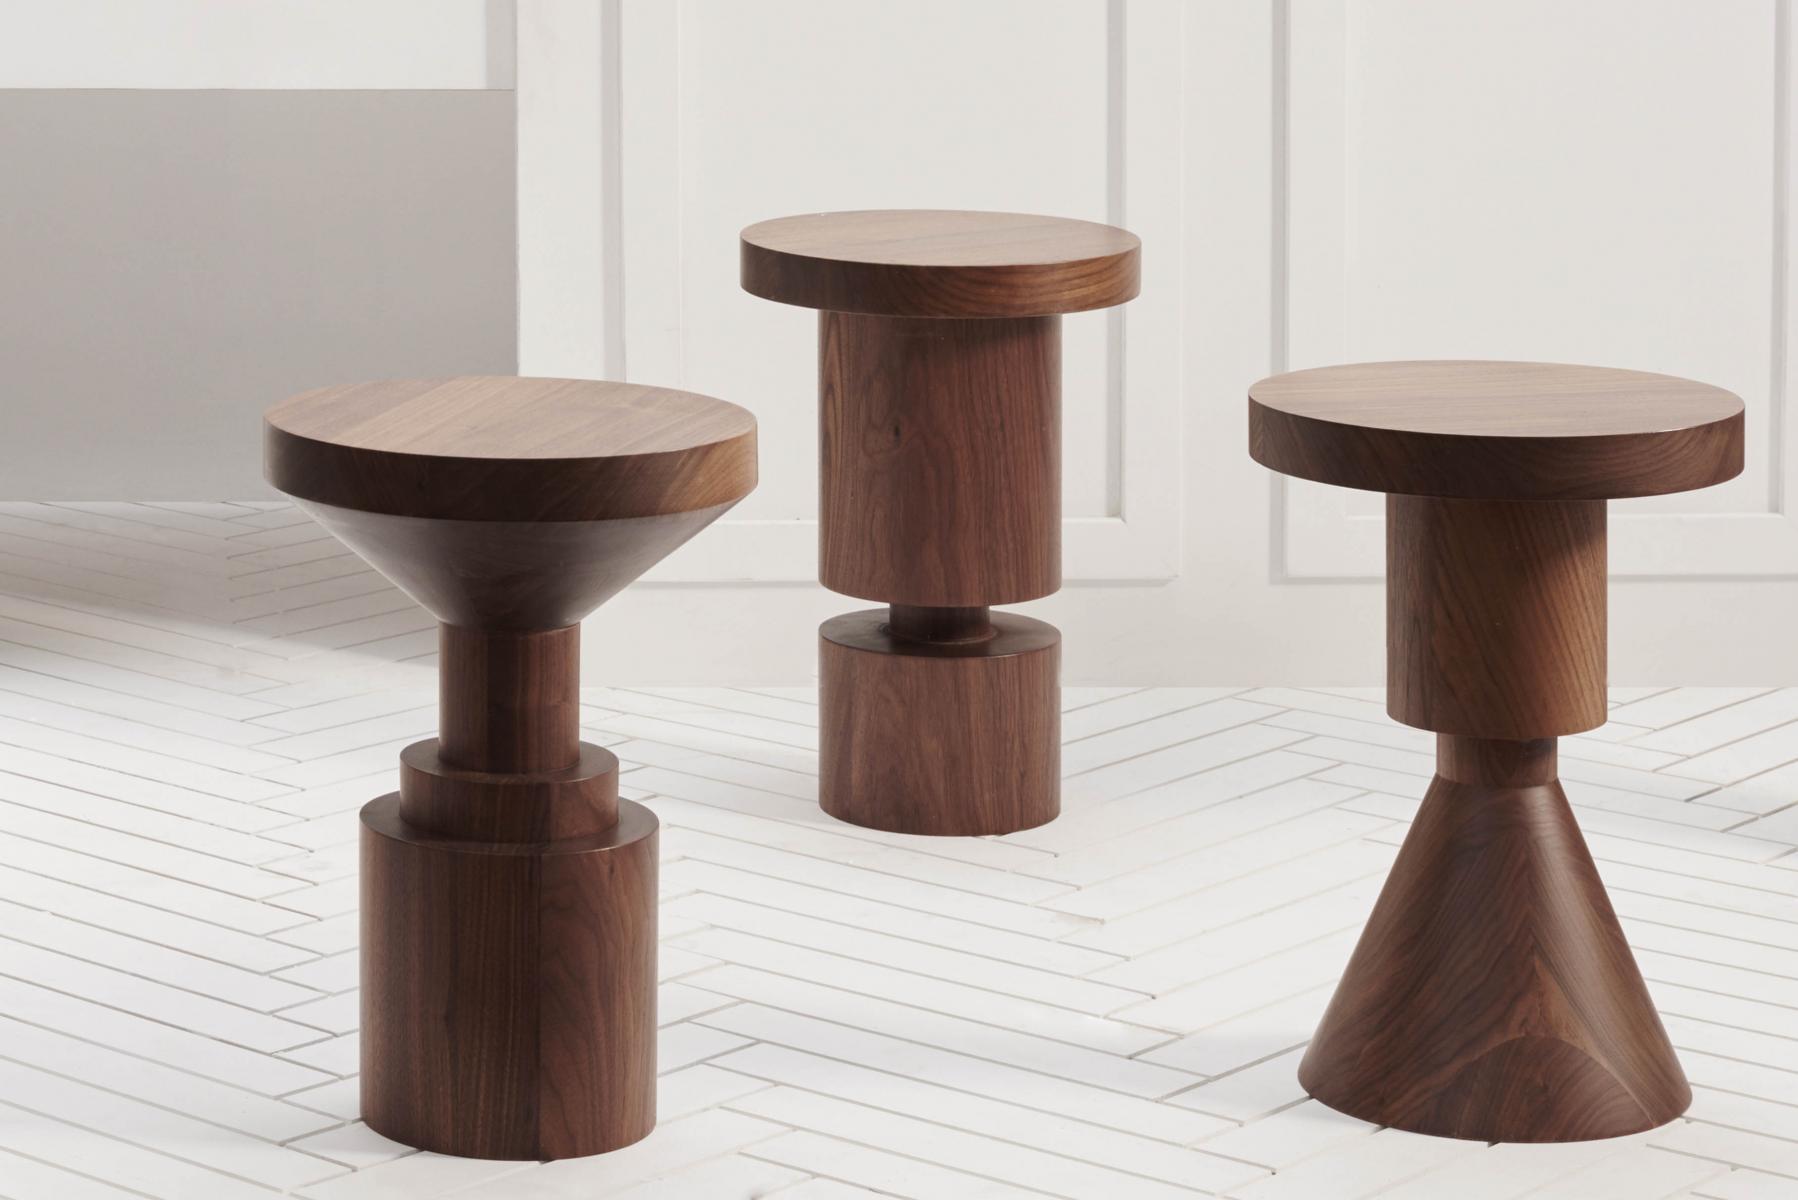 wooden-chess-piece-stool-by-anna-karlin-1.jpg